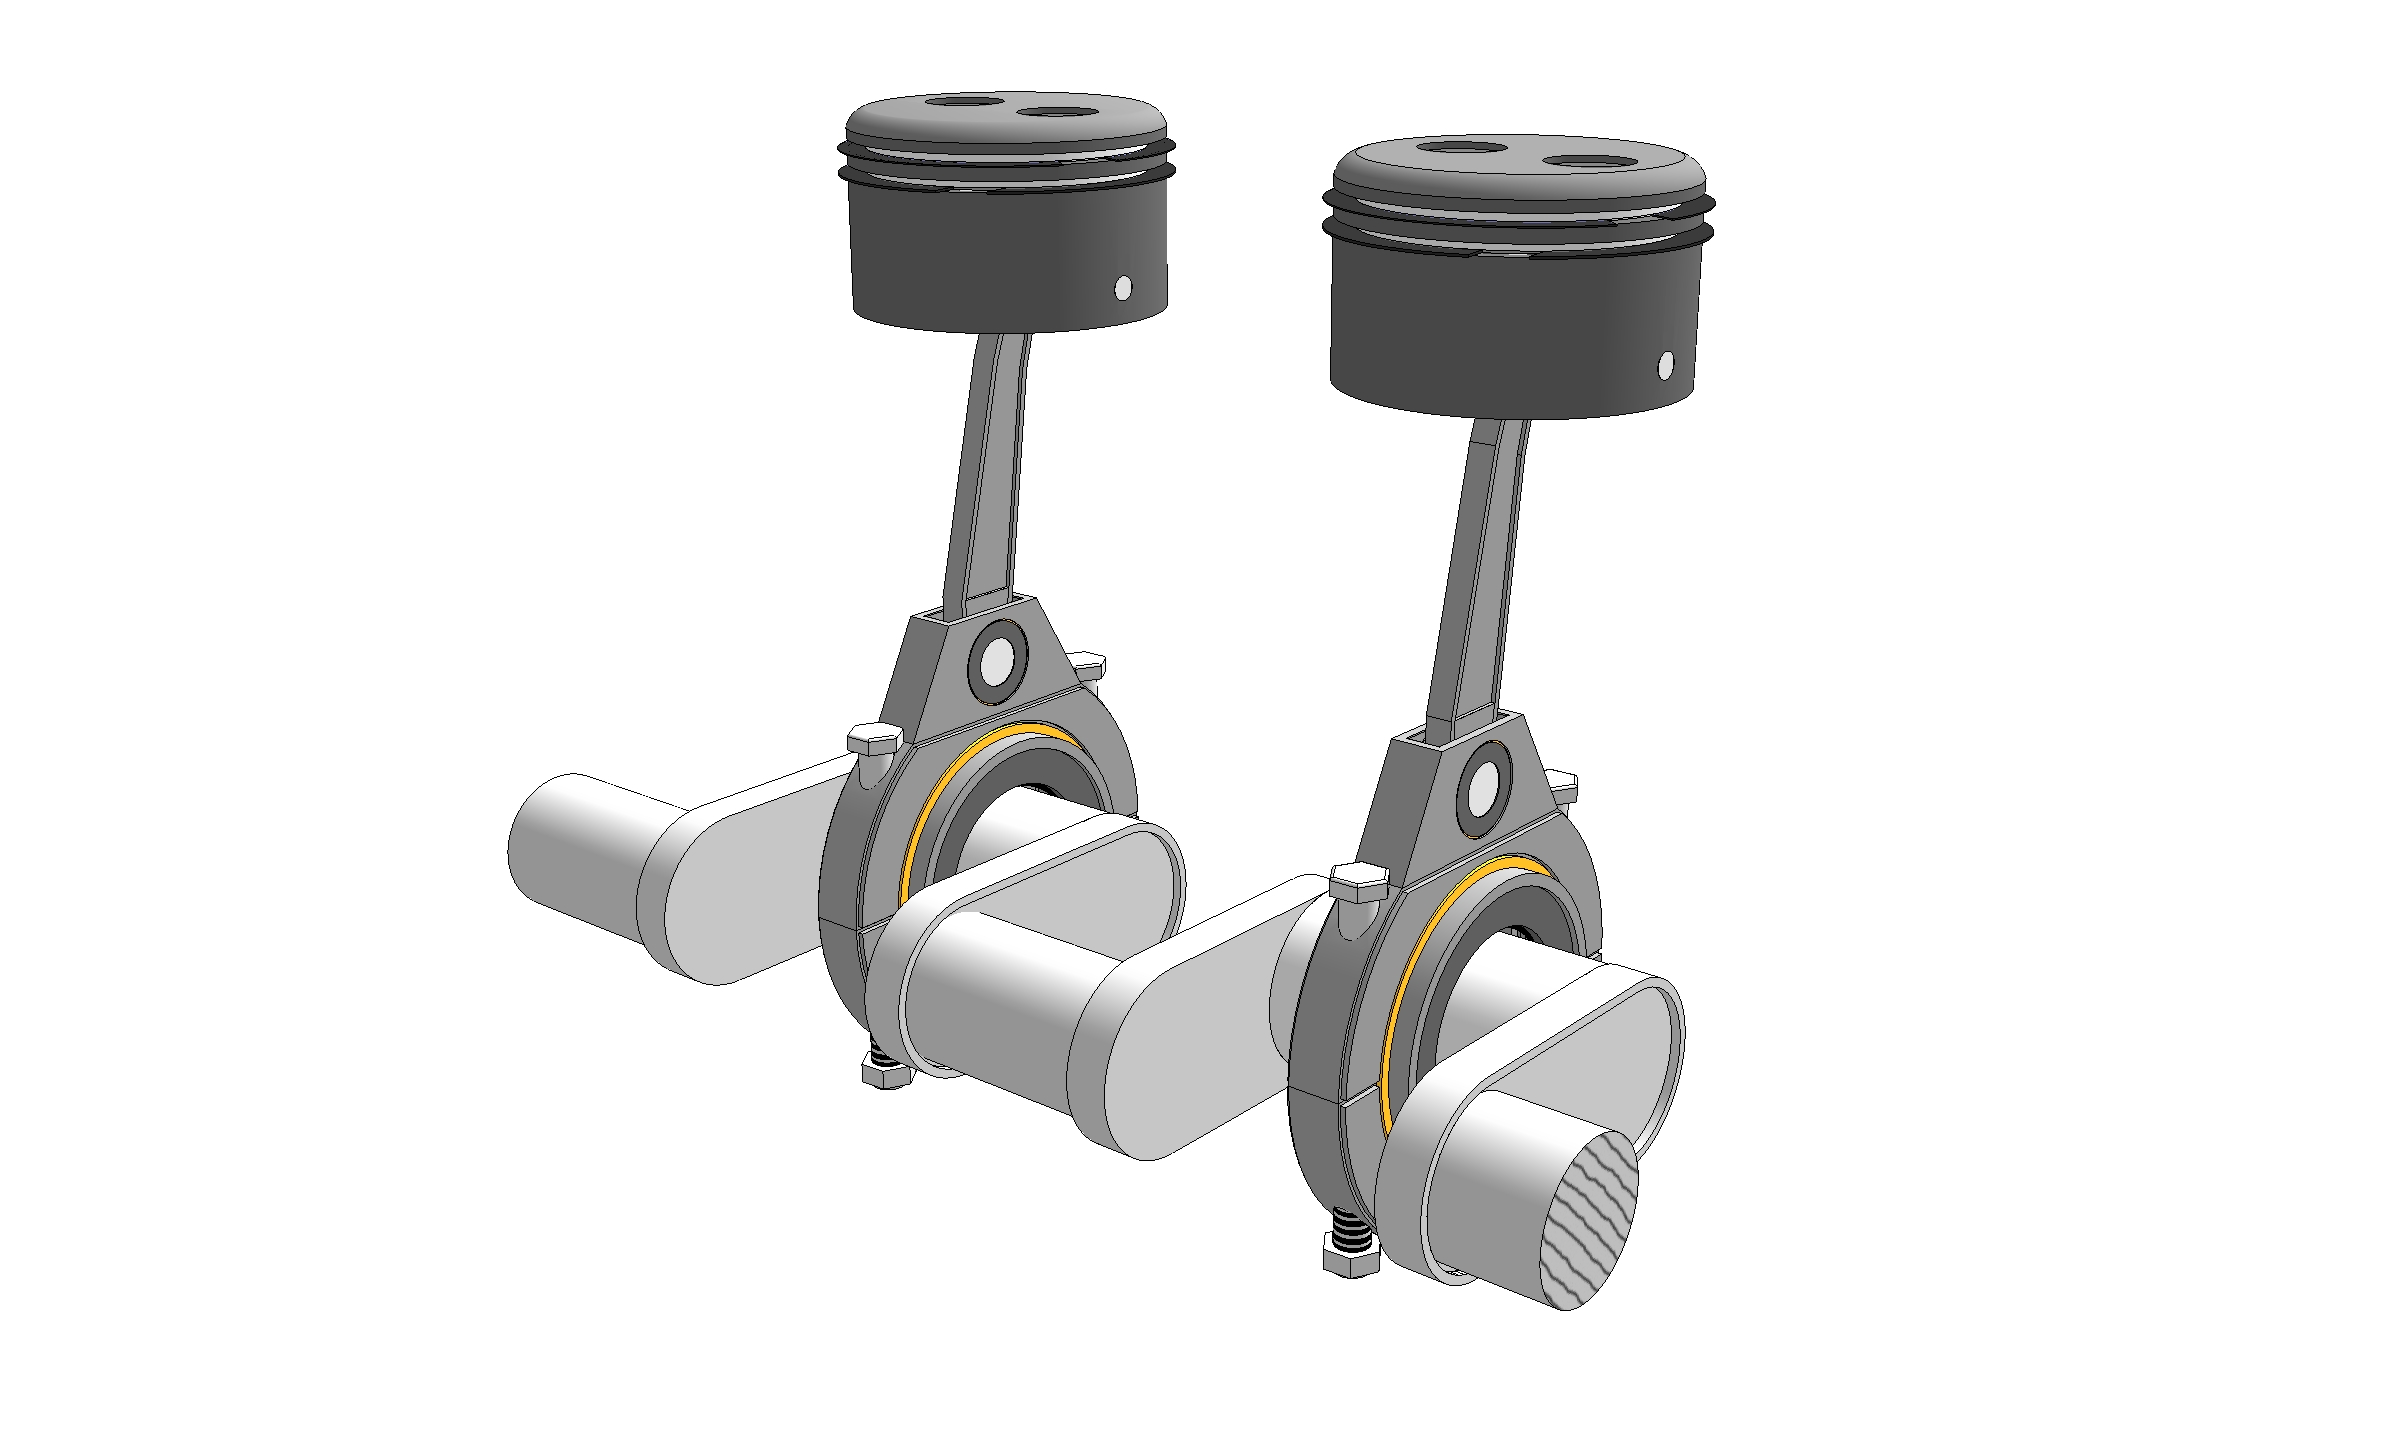 3d Illustration Pistons And Crankshaft